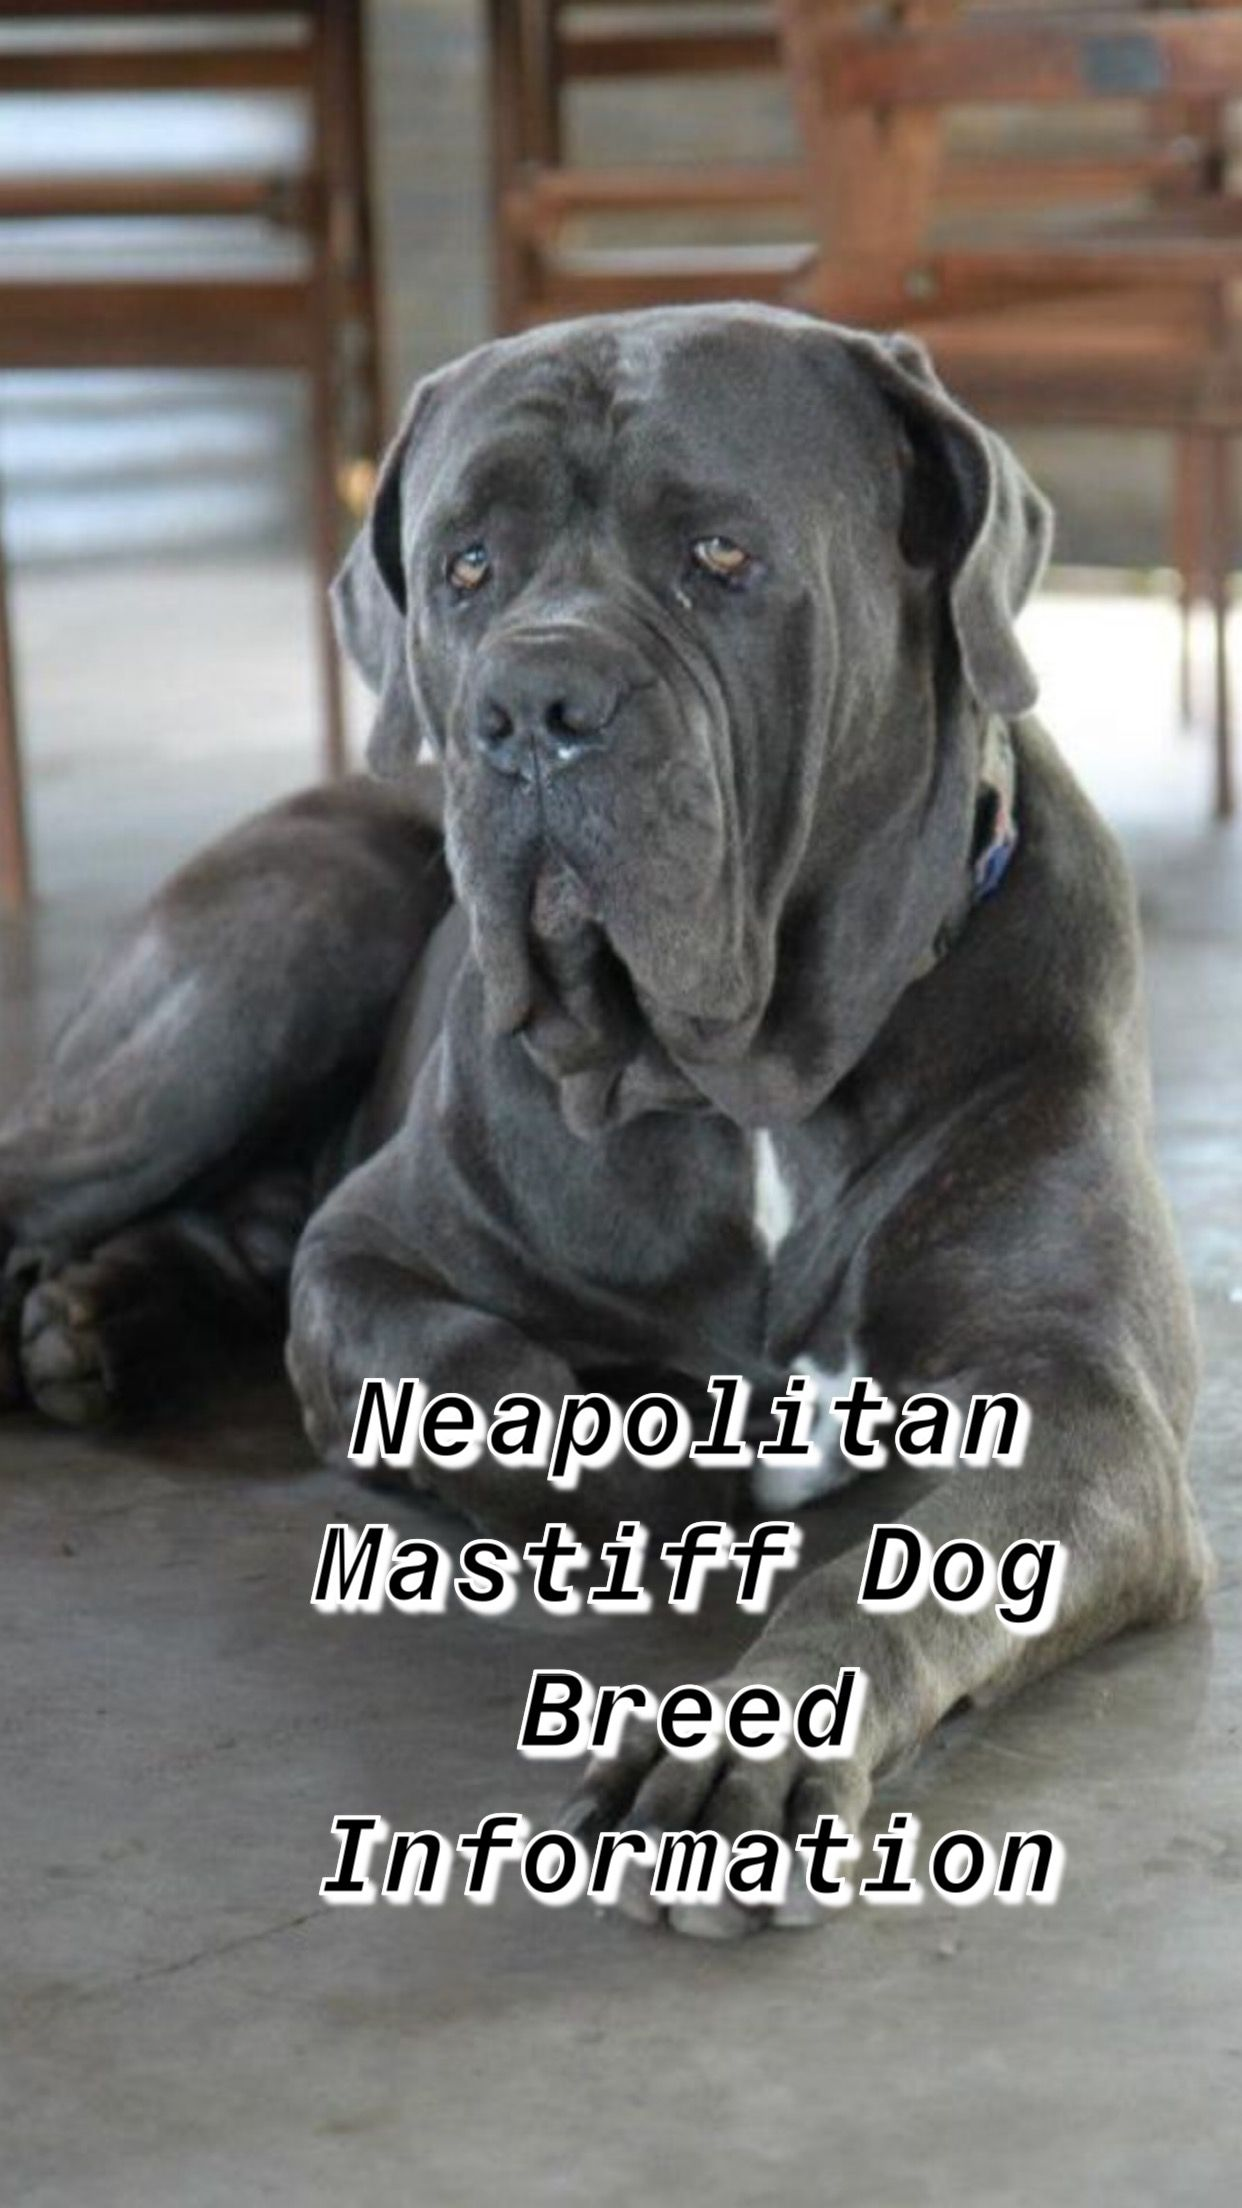 Neapolitan Mastiff Breed Information With Images Neapolitan